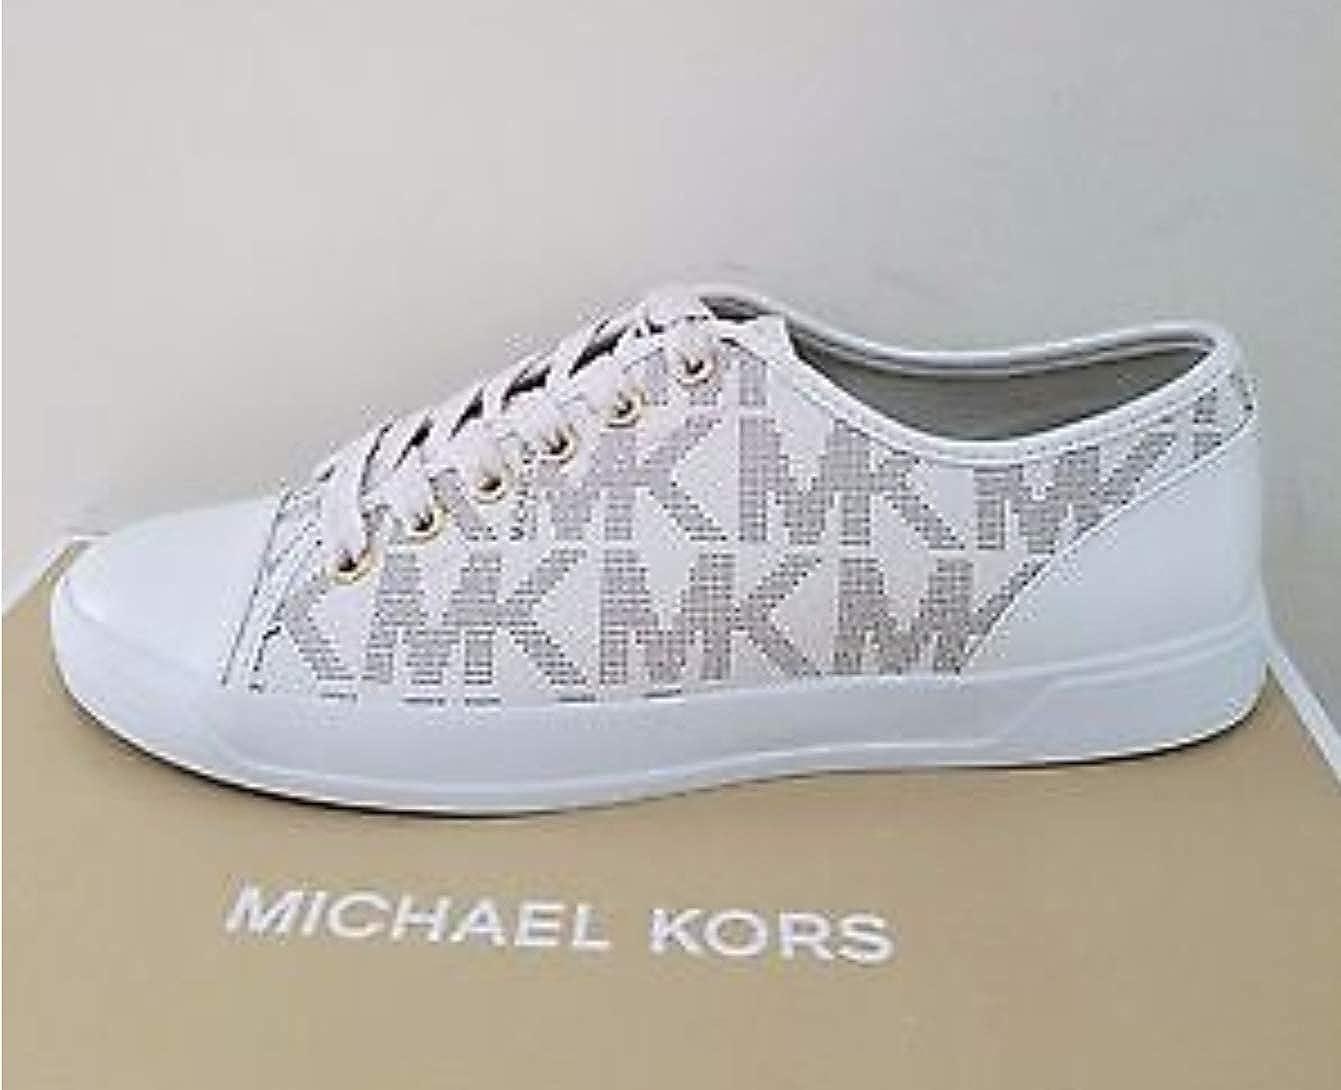 shoes michael kors sneakers